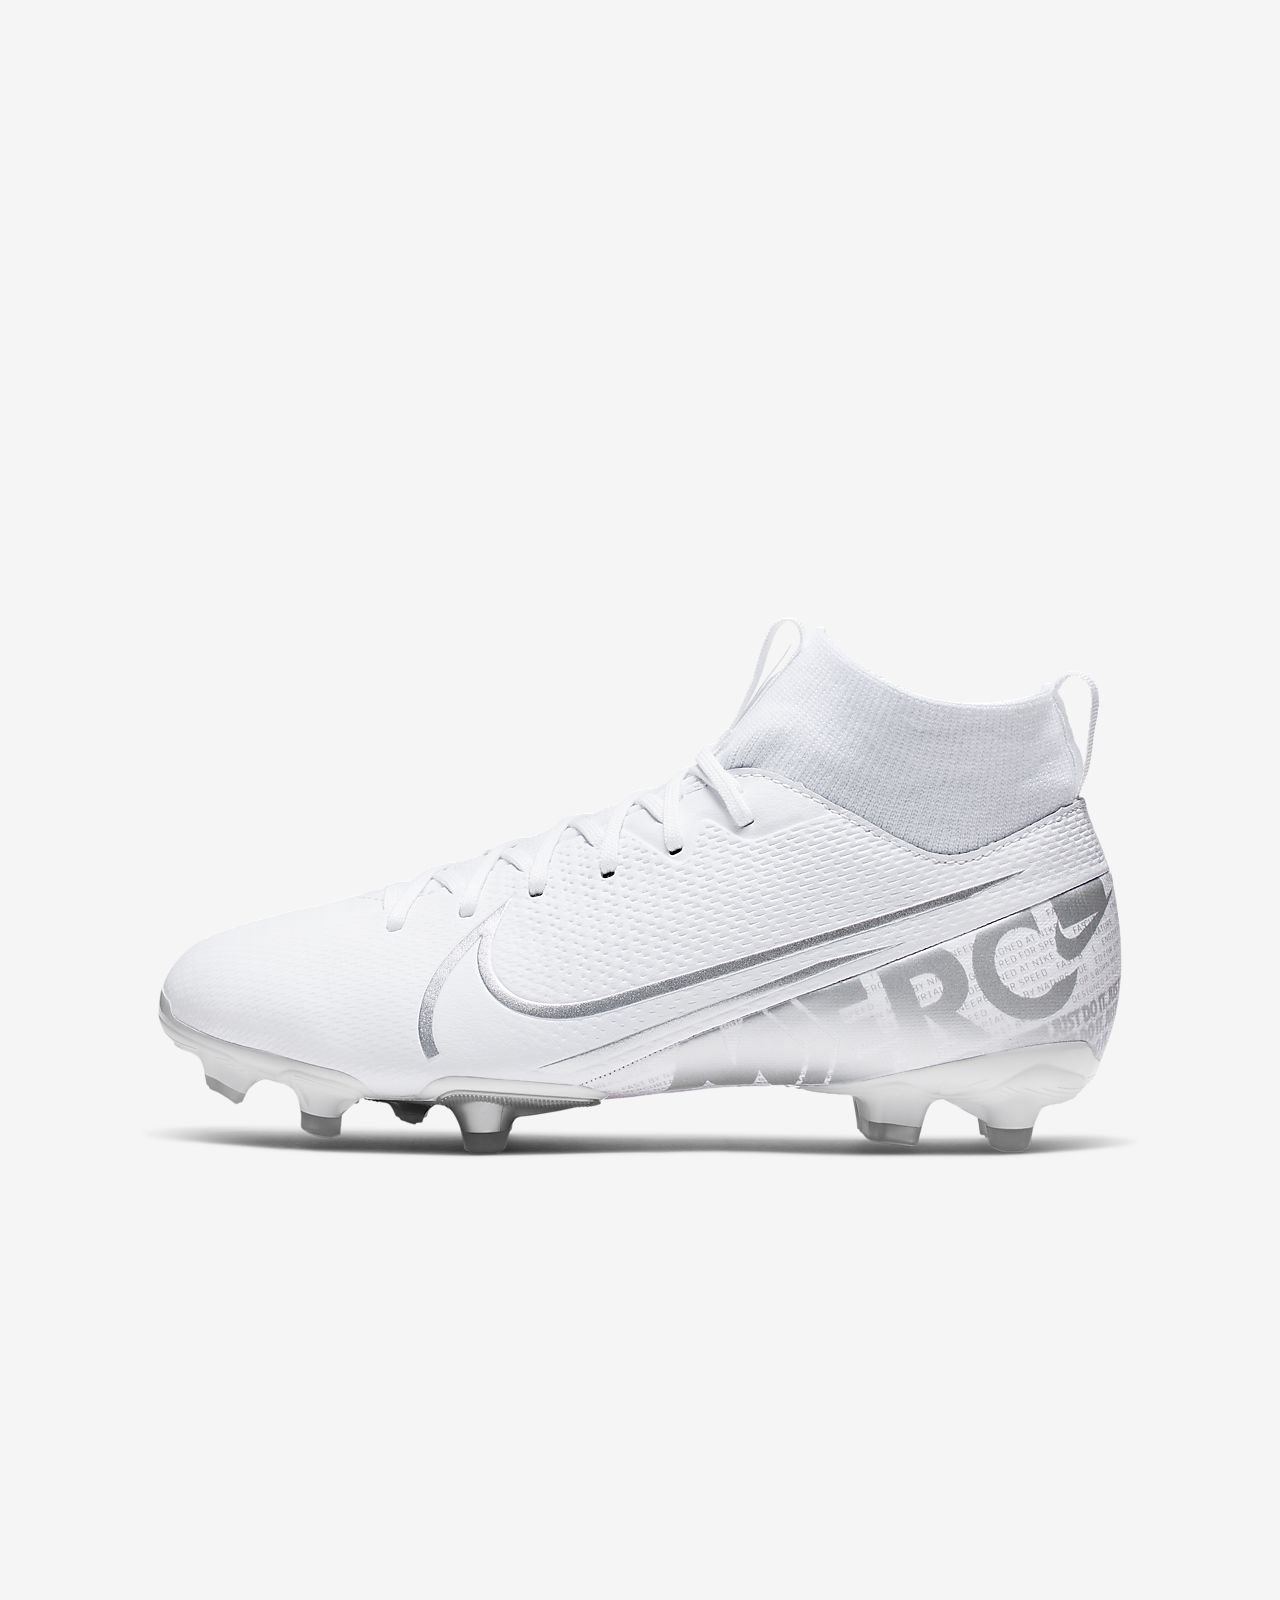 Chaussure de football multi surfaces à crampons Nike Jr. Mercurial Superfly 7 Academy MG pour Enfant